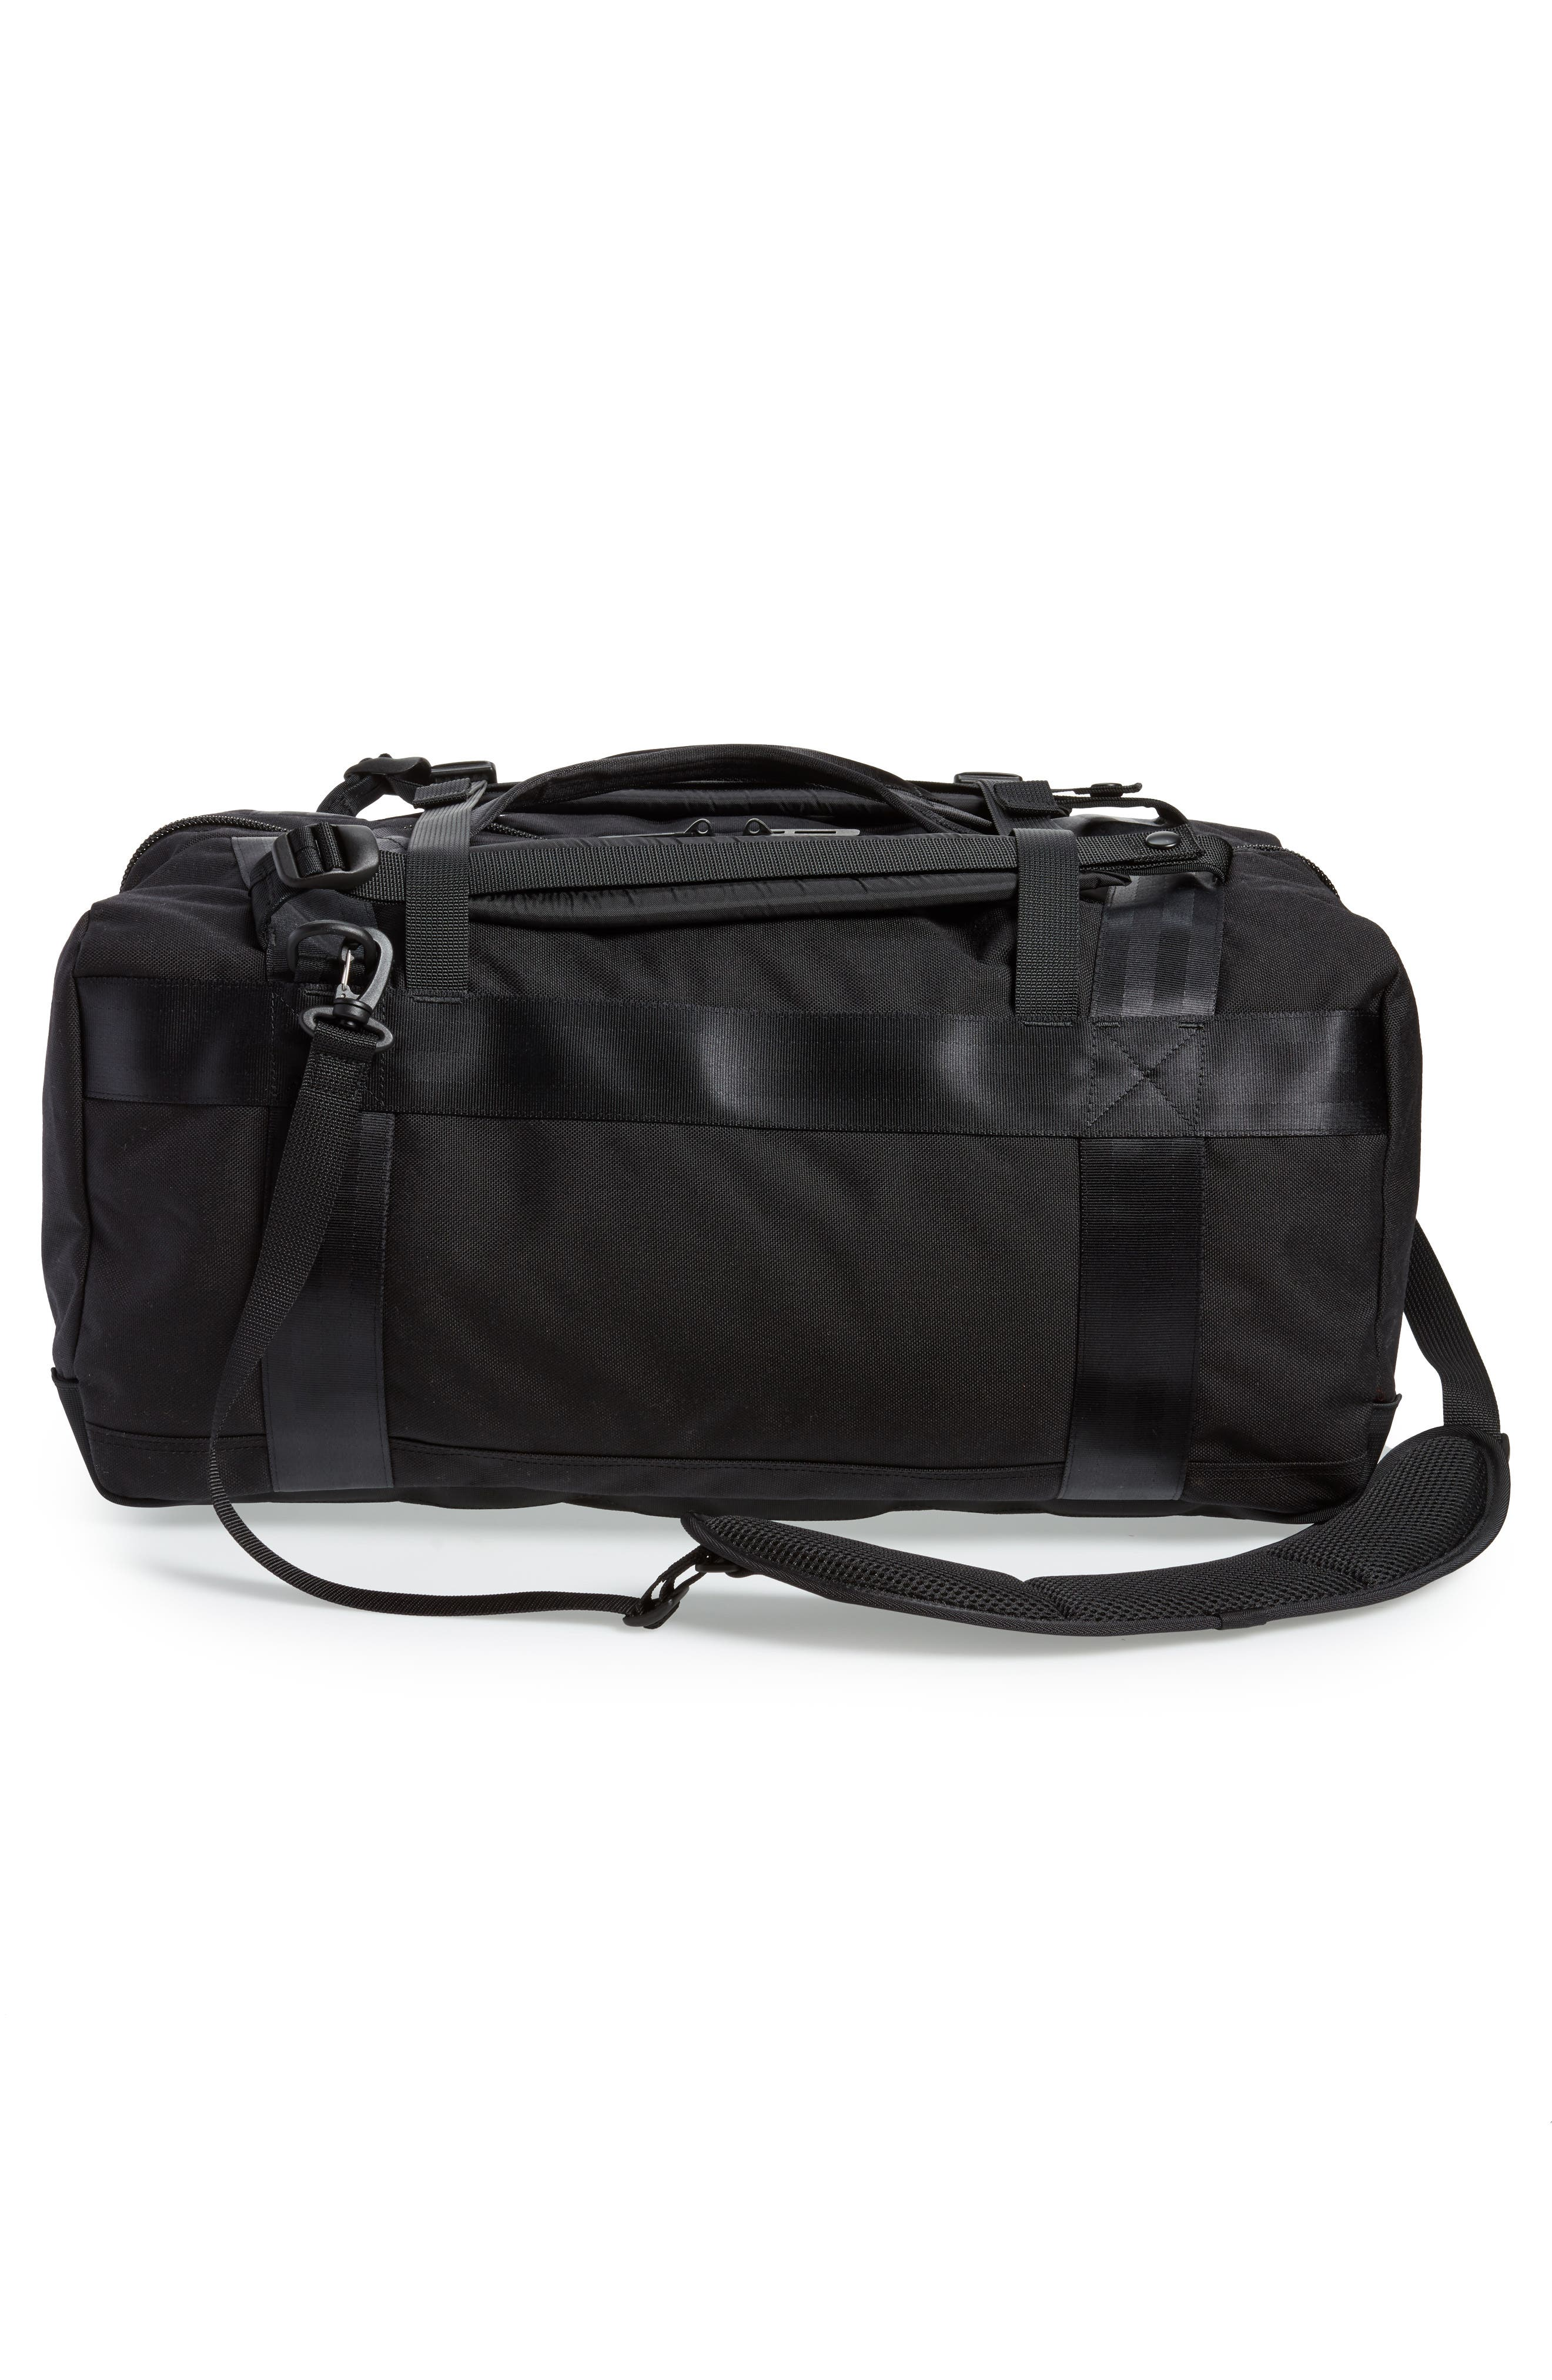 Porter-Yoshida & Co. Boothpack Convertible Duffel Bag,                             Alternate thumbnail 4, color,                             BLACK